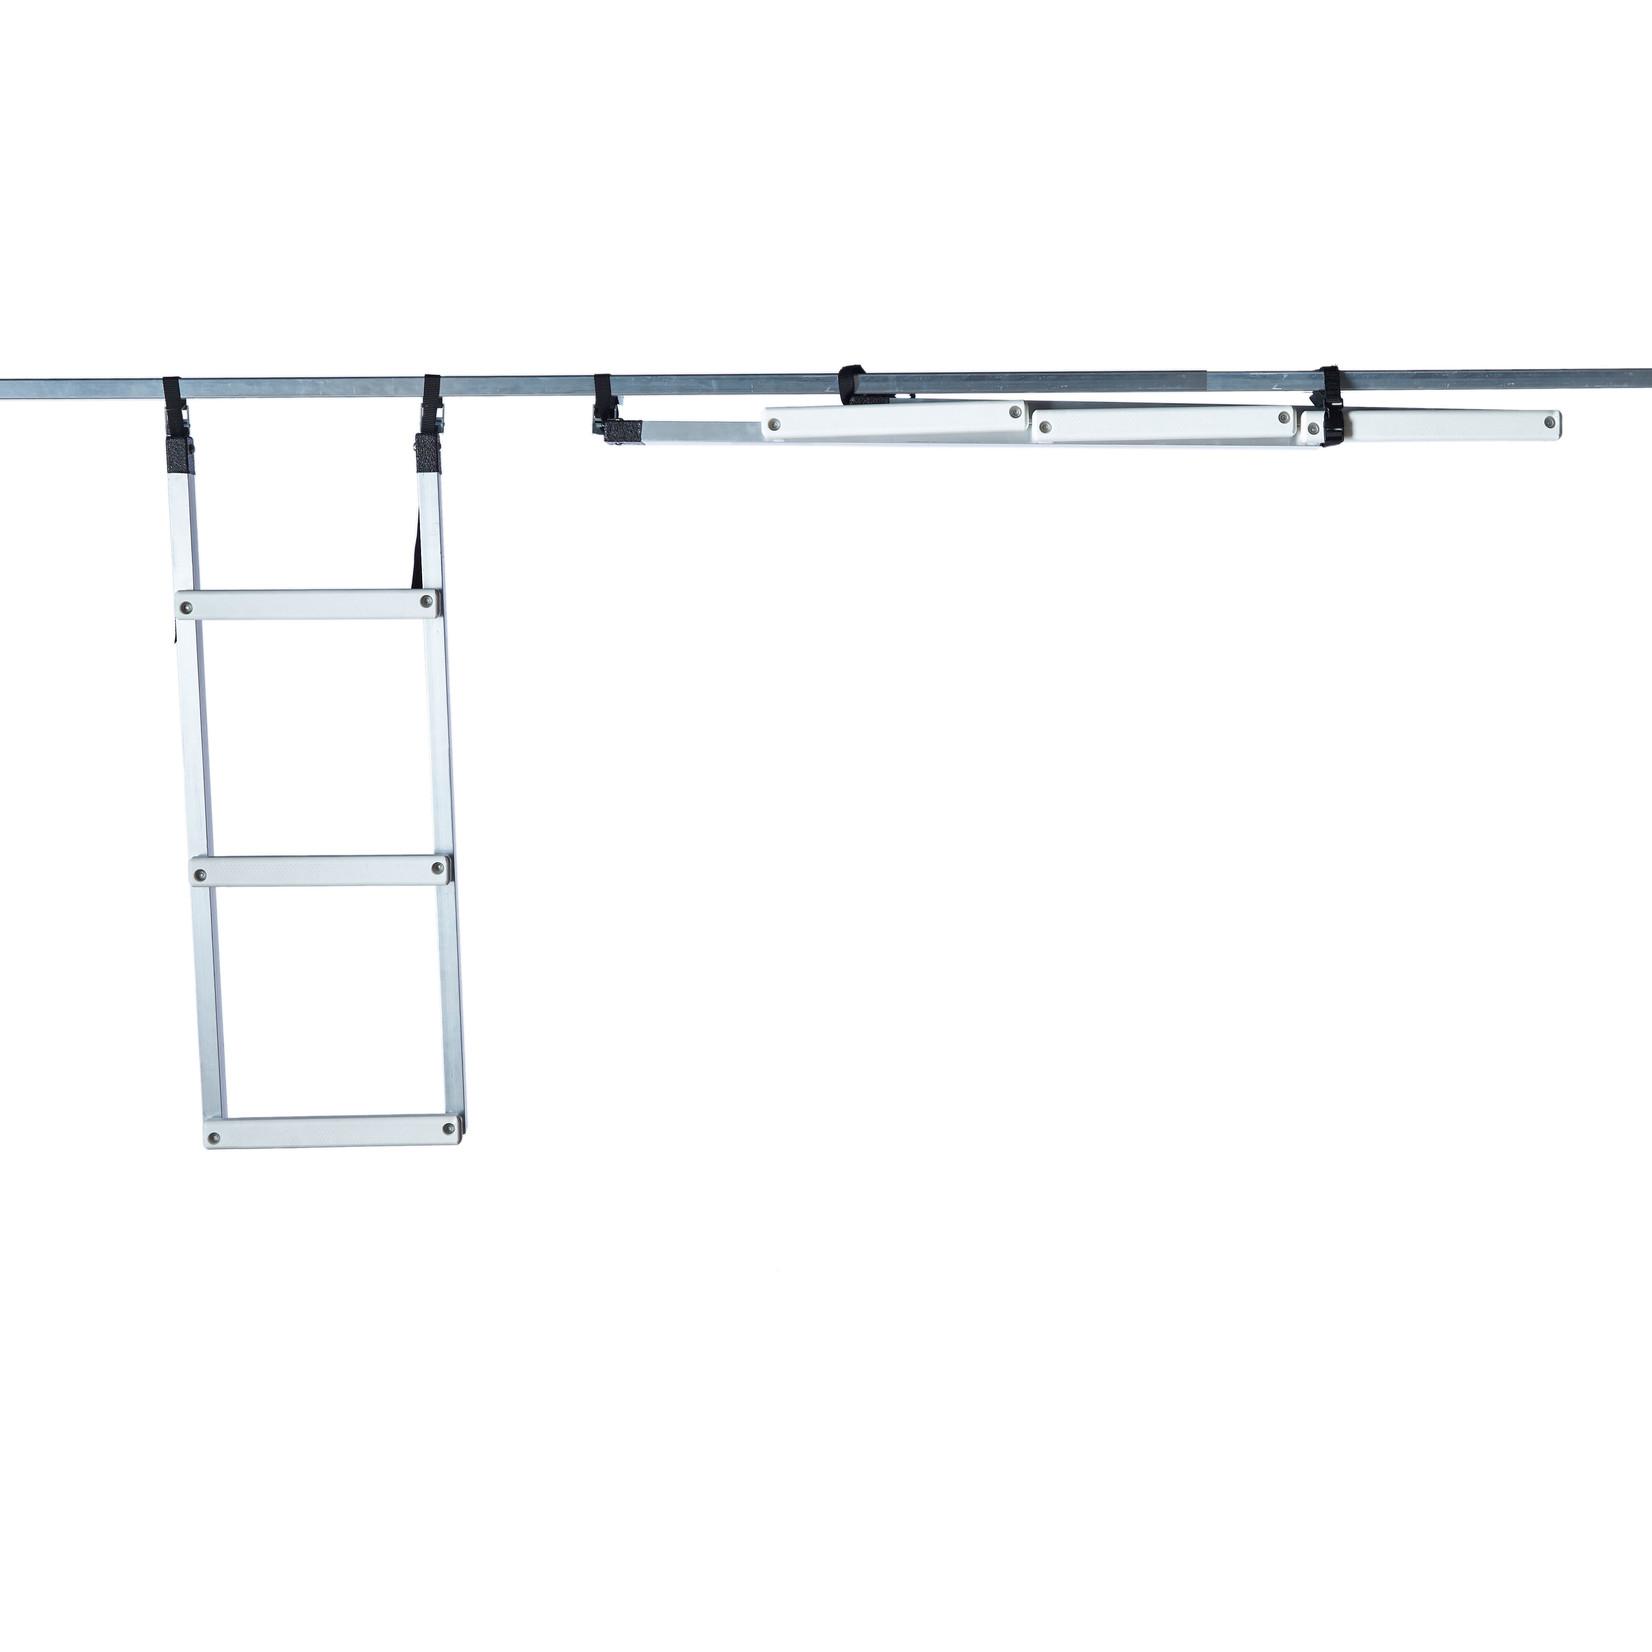 DownStream River Gear Down Stream River Gear Aluminum Raft Ladder